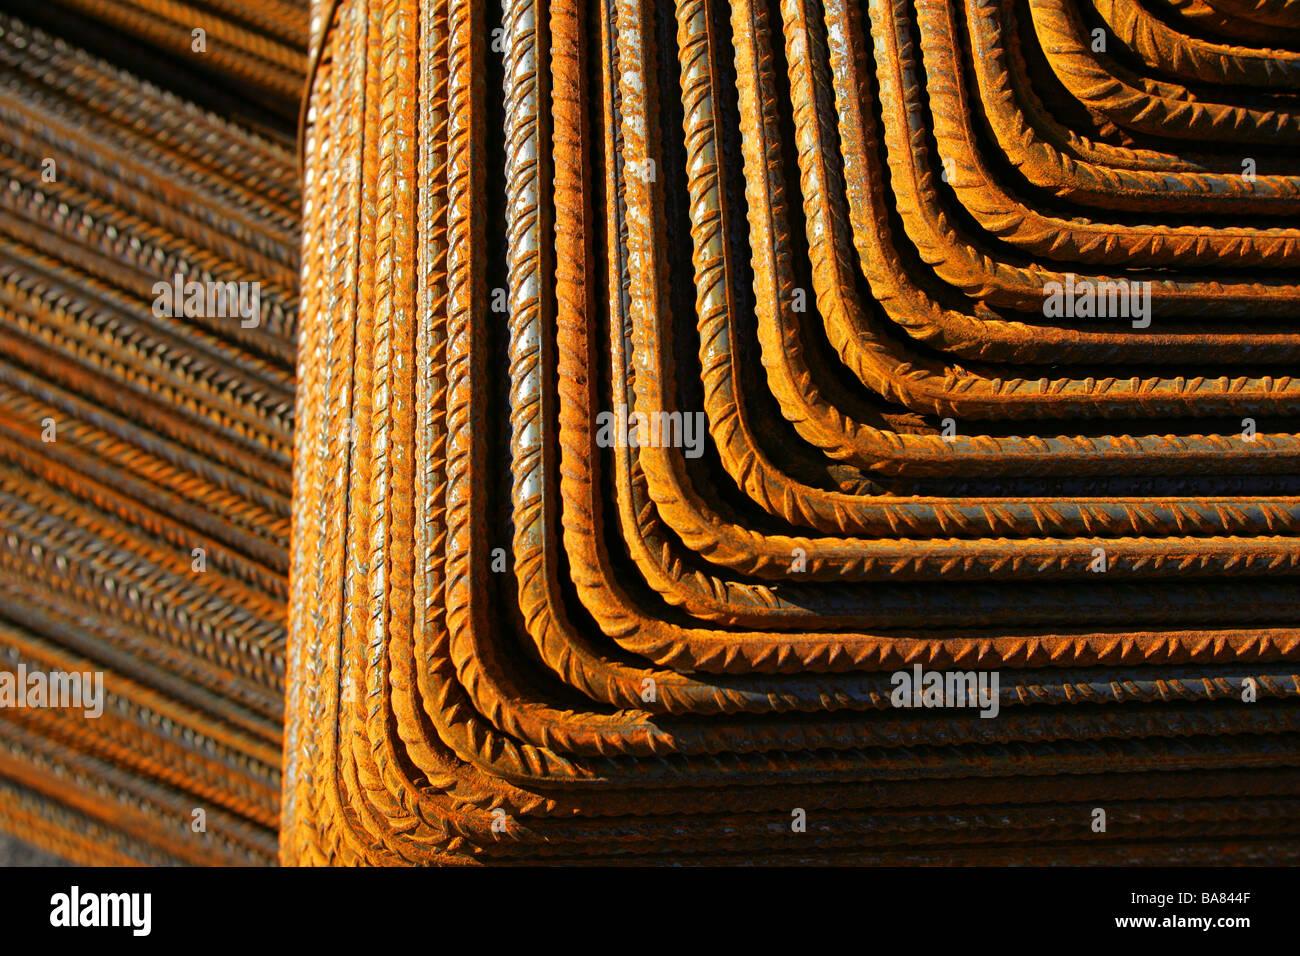 Steel rods - Stock Image